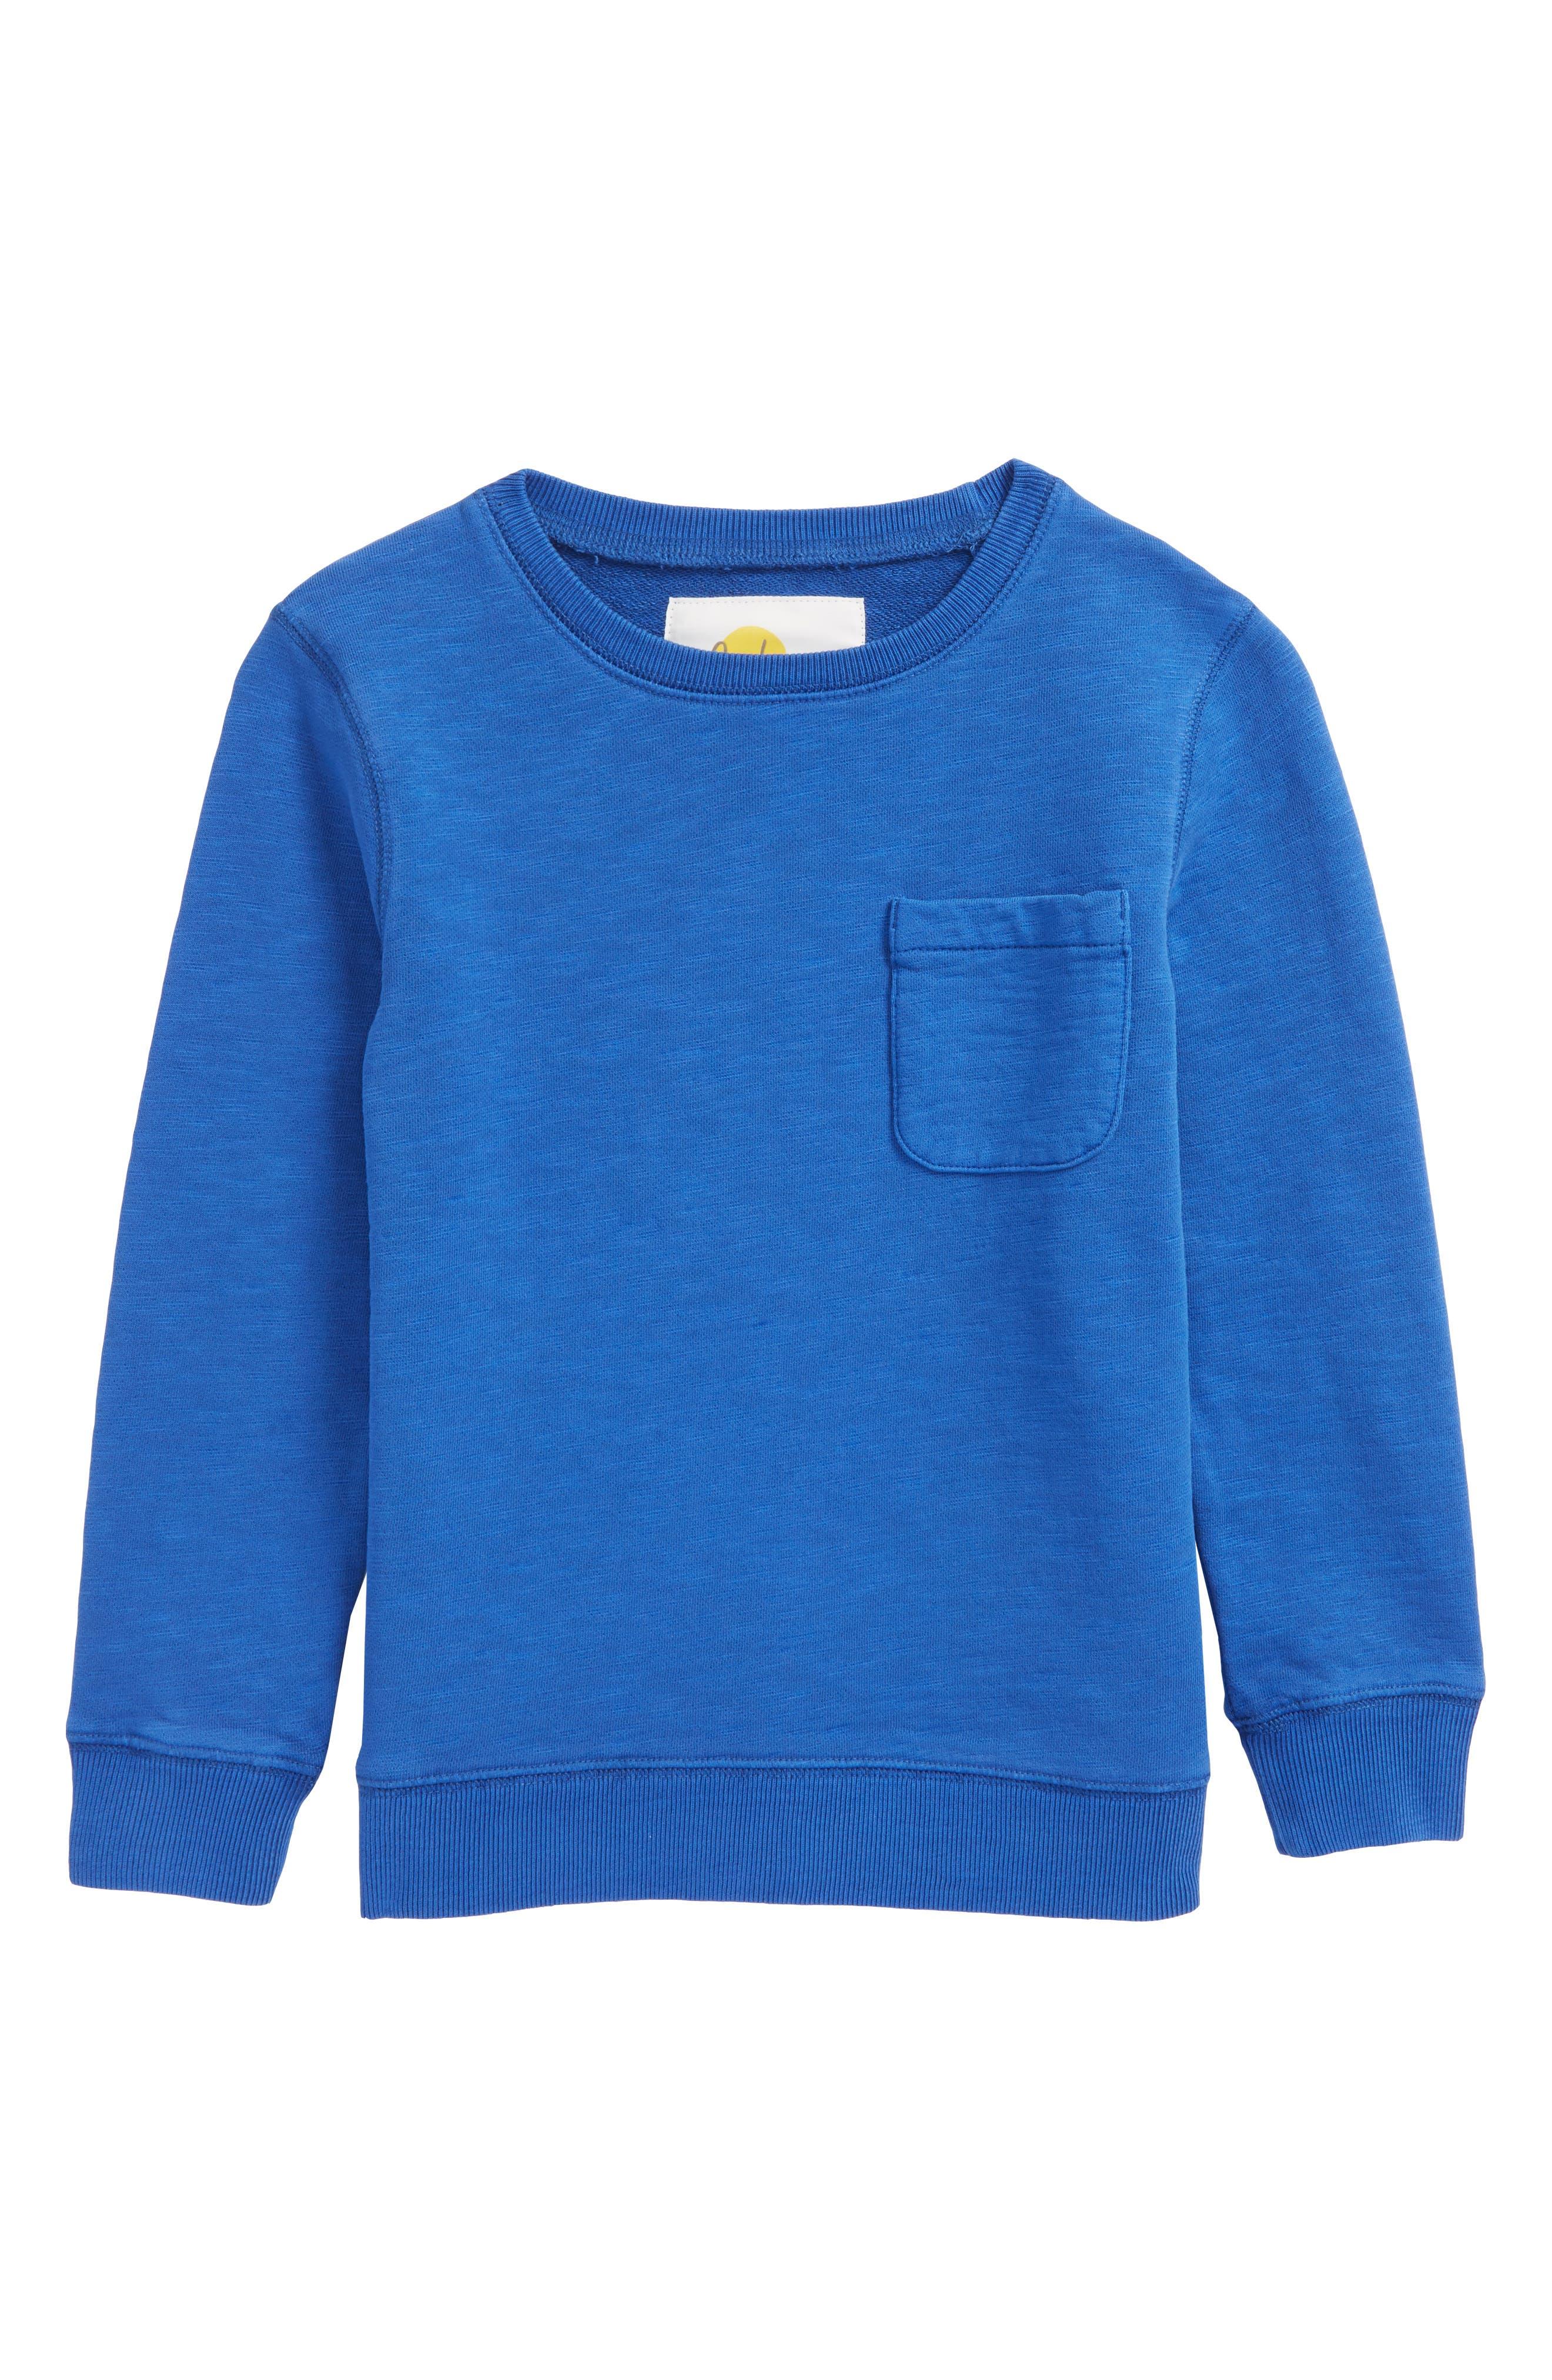 Alternate Image 1 Selected - Mini Boden Pocket Crewneck Sweatshirt (Toddler Boys, Little Boys & Big Boys)